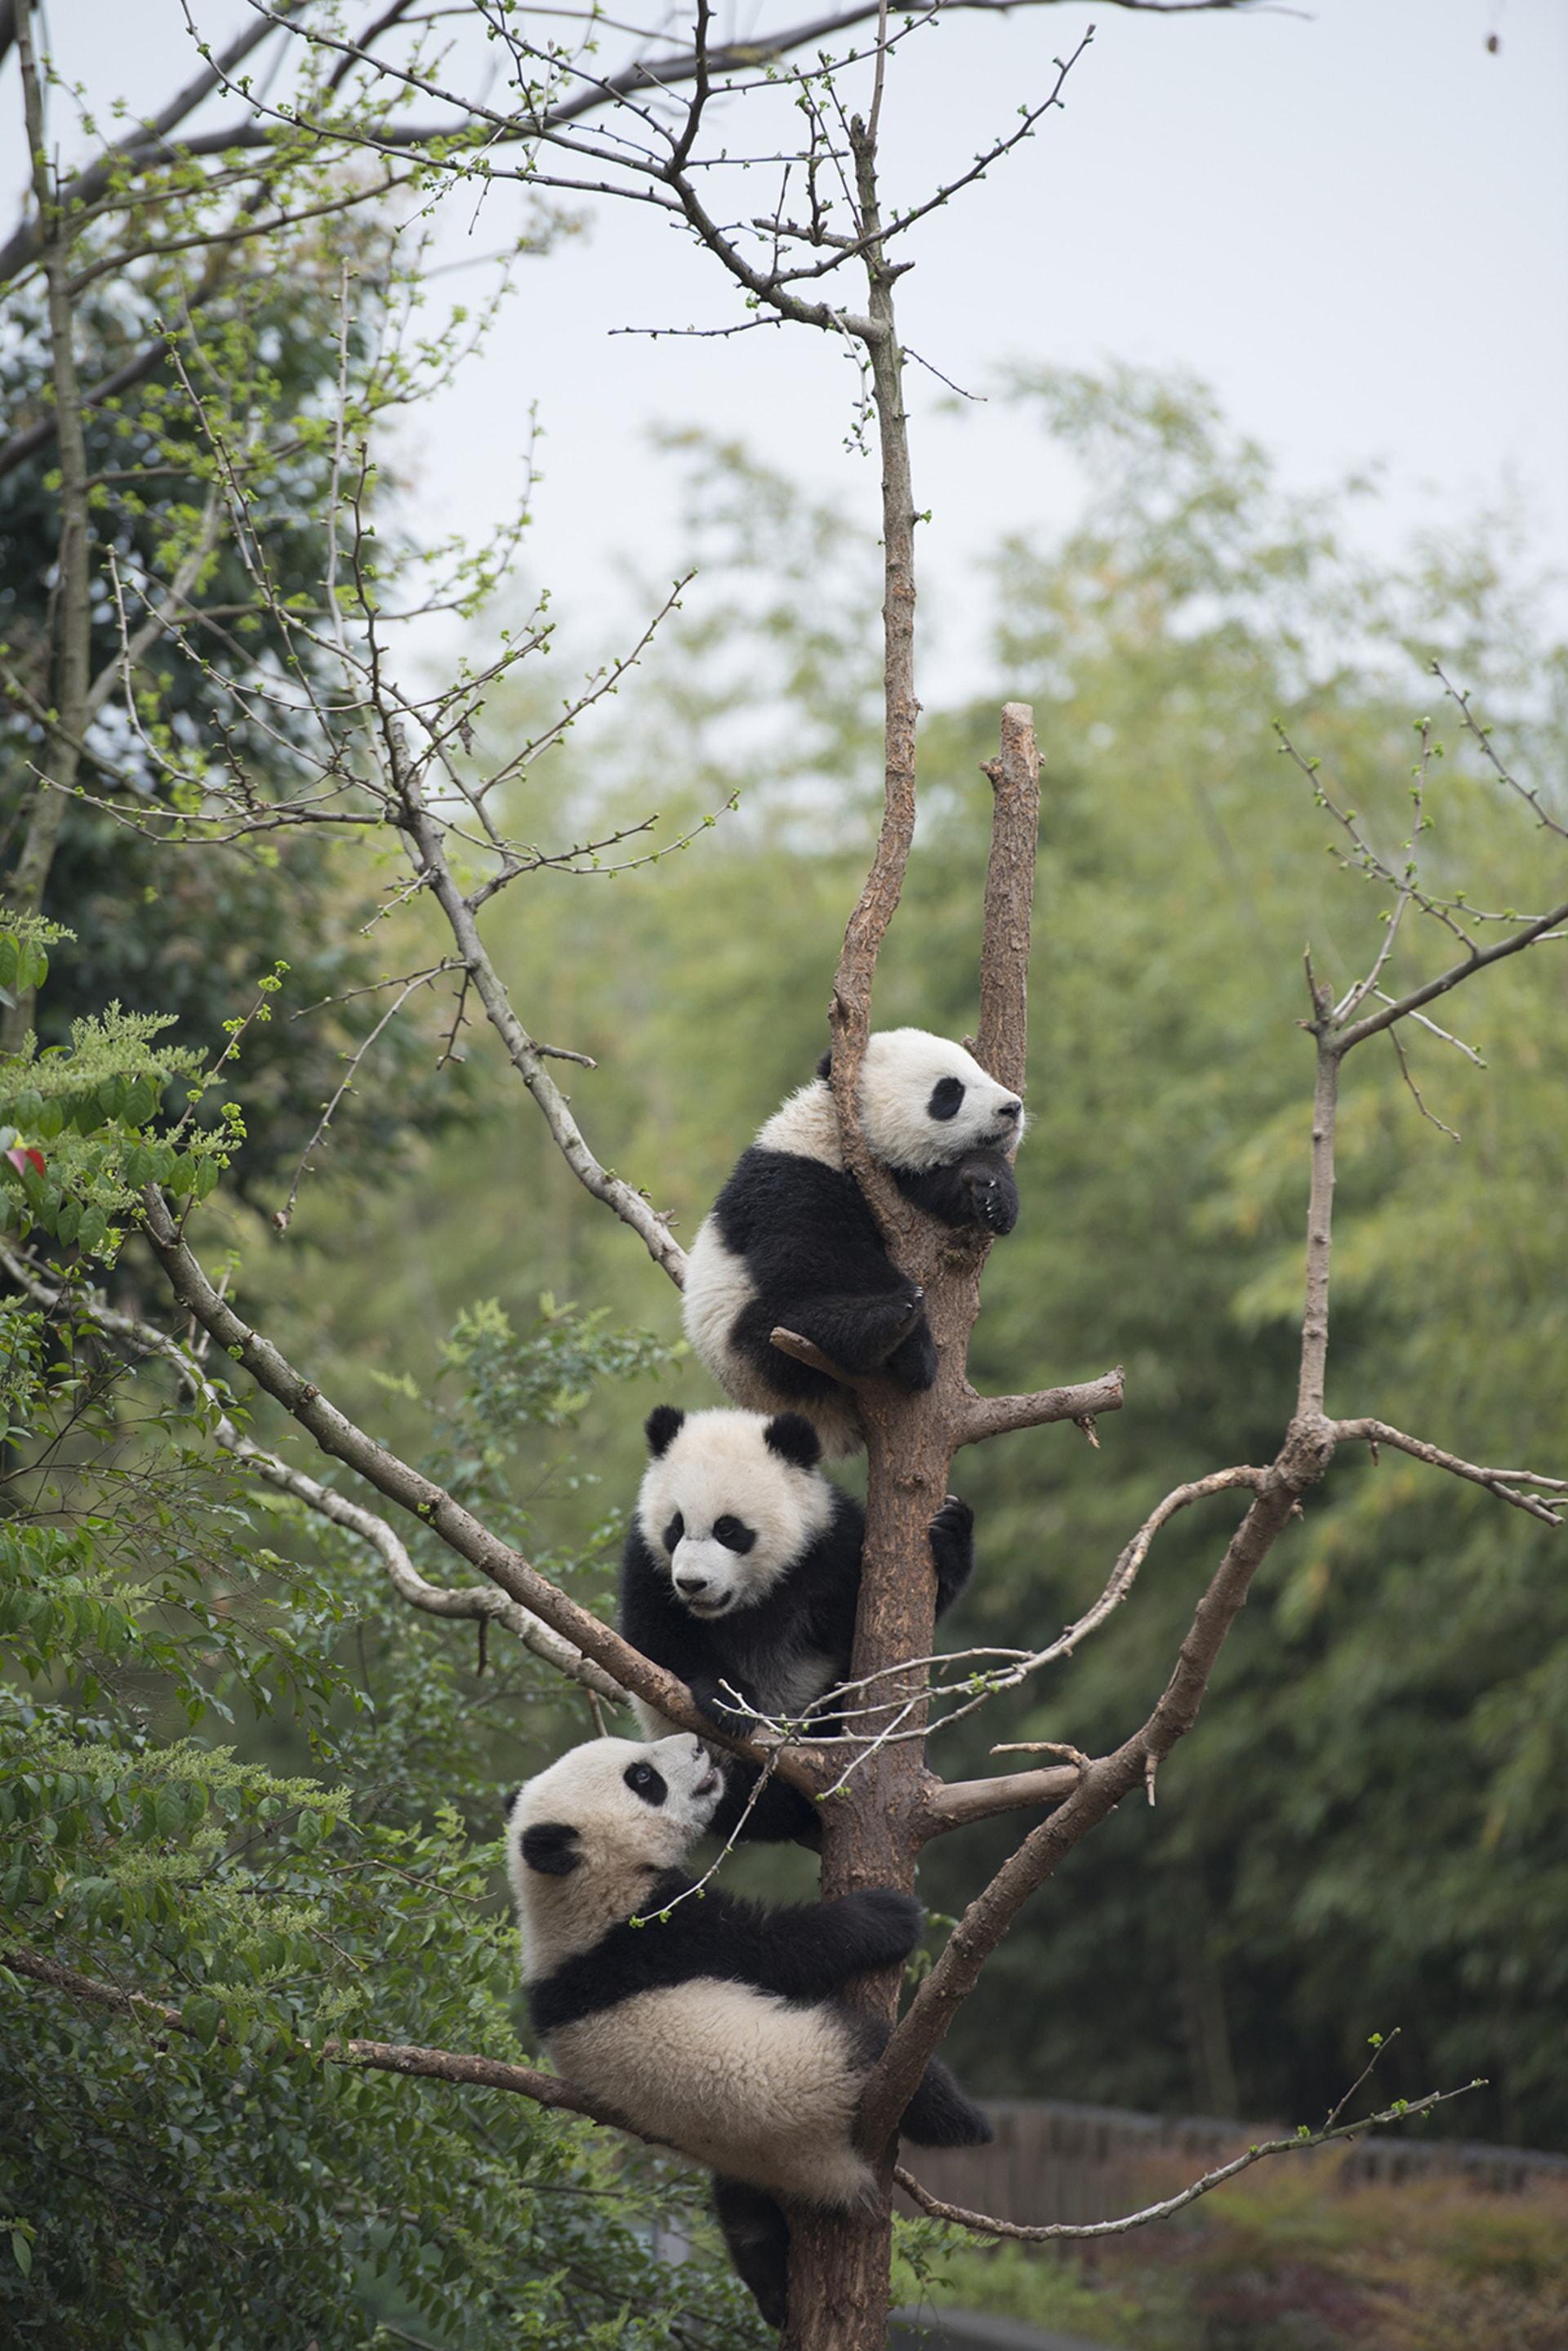 Giant Panda cubs developing their tree-climbing skills at China's Chengdu Panda Base as seen in the new IMAX® film, PANDAS